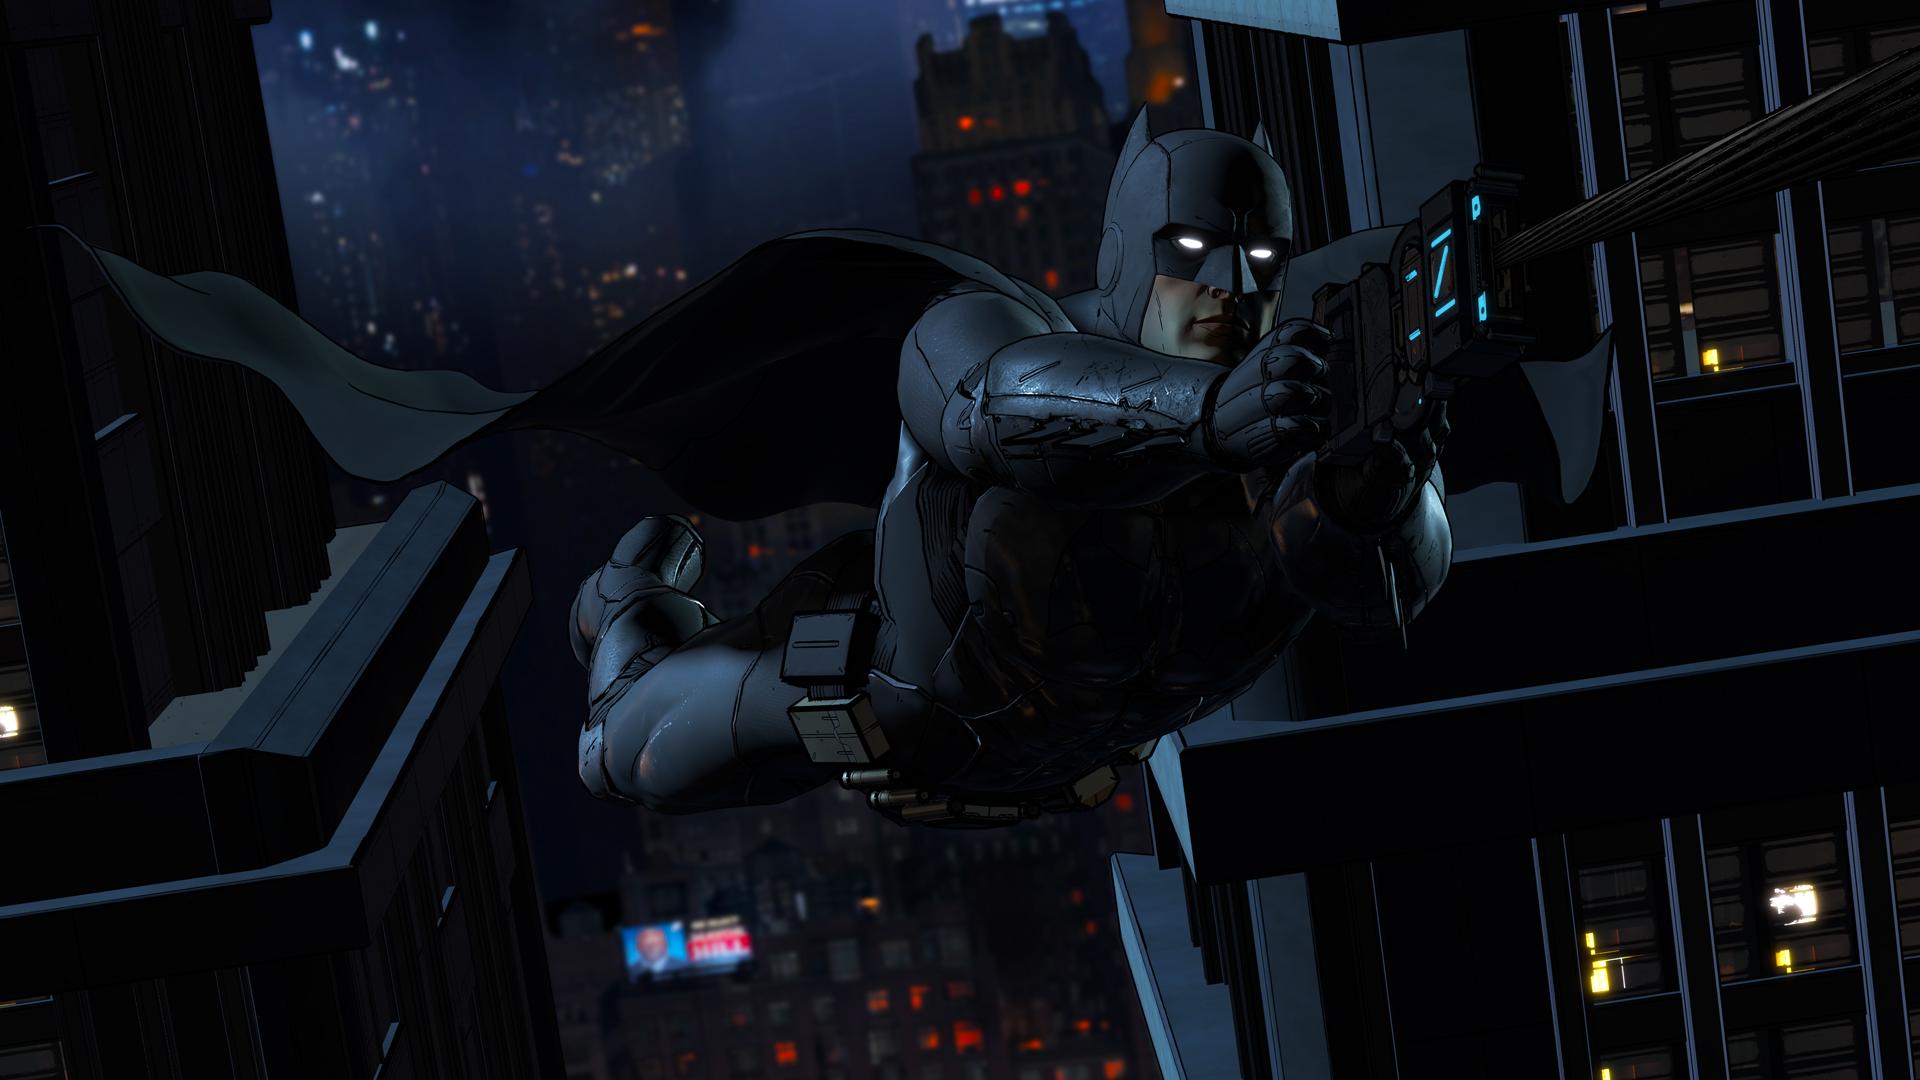 Telltale's Batman Series Launching Next Month